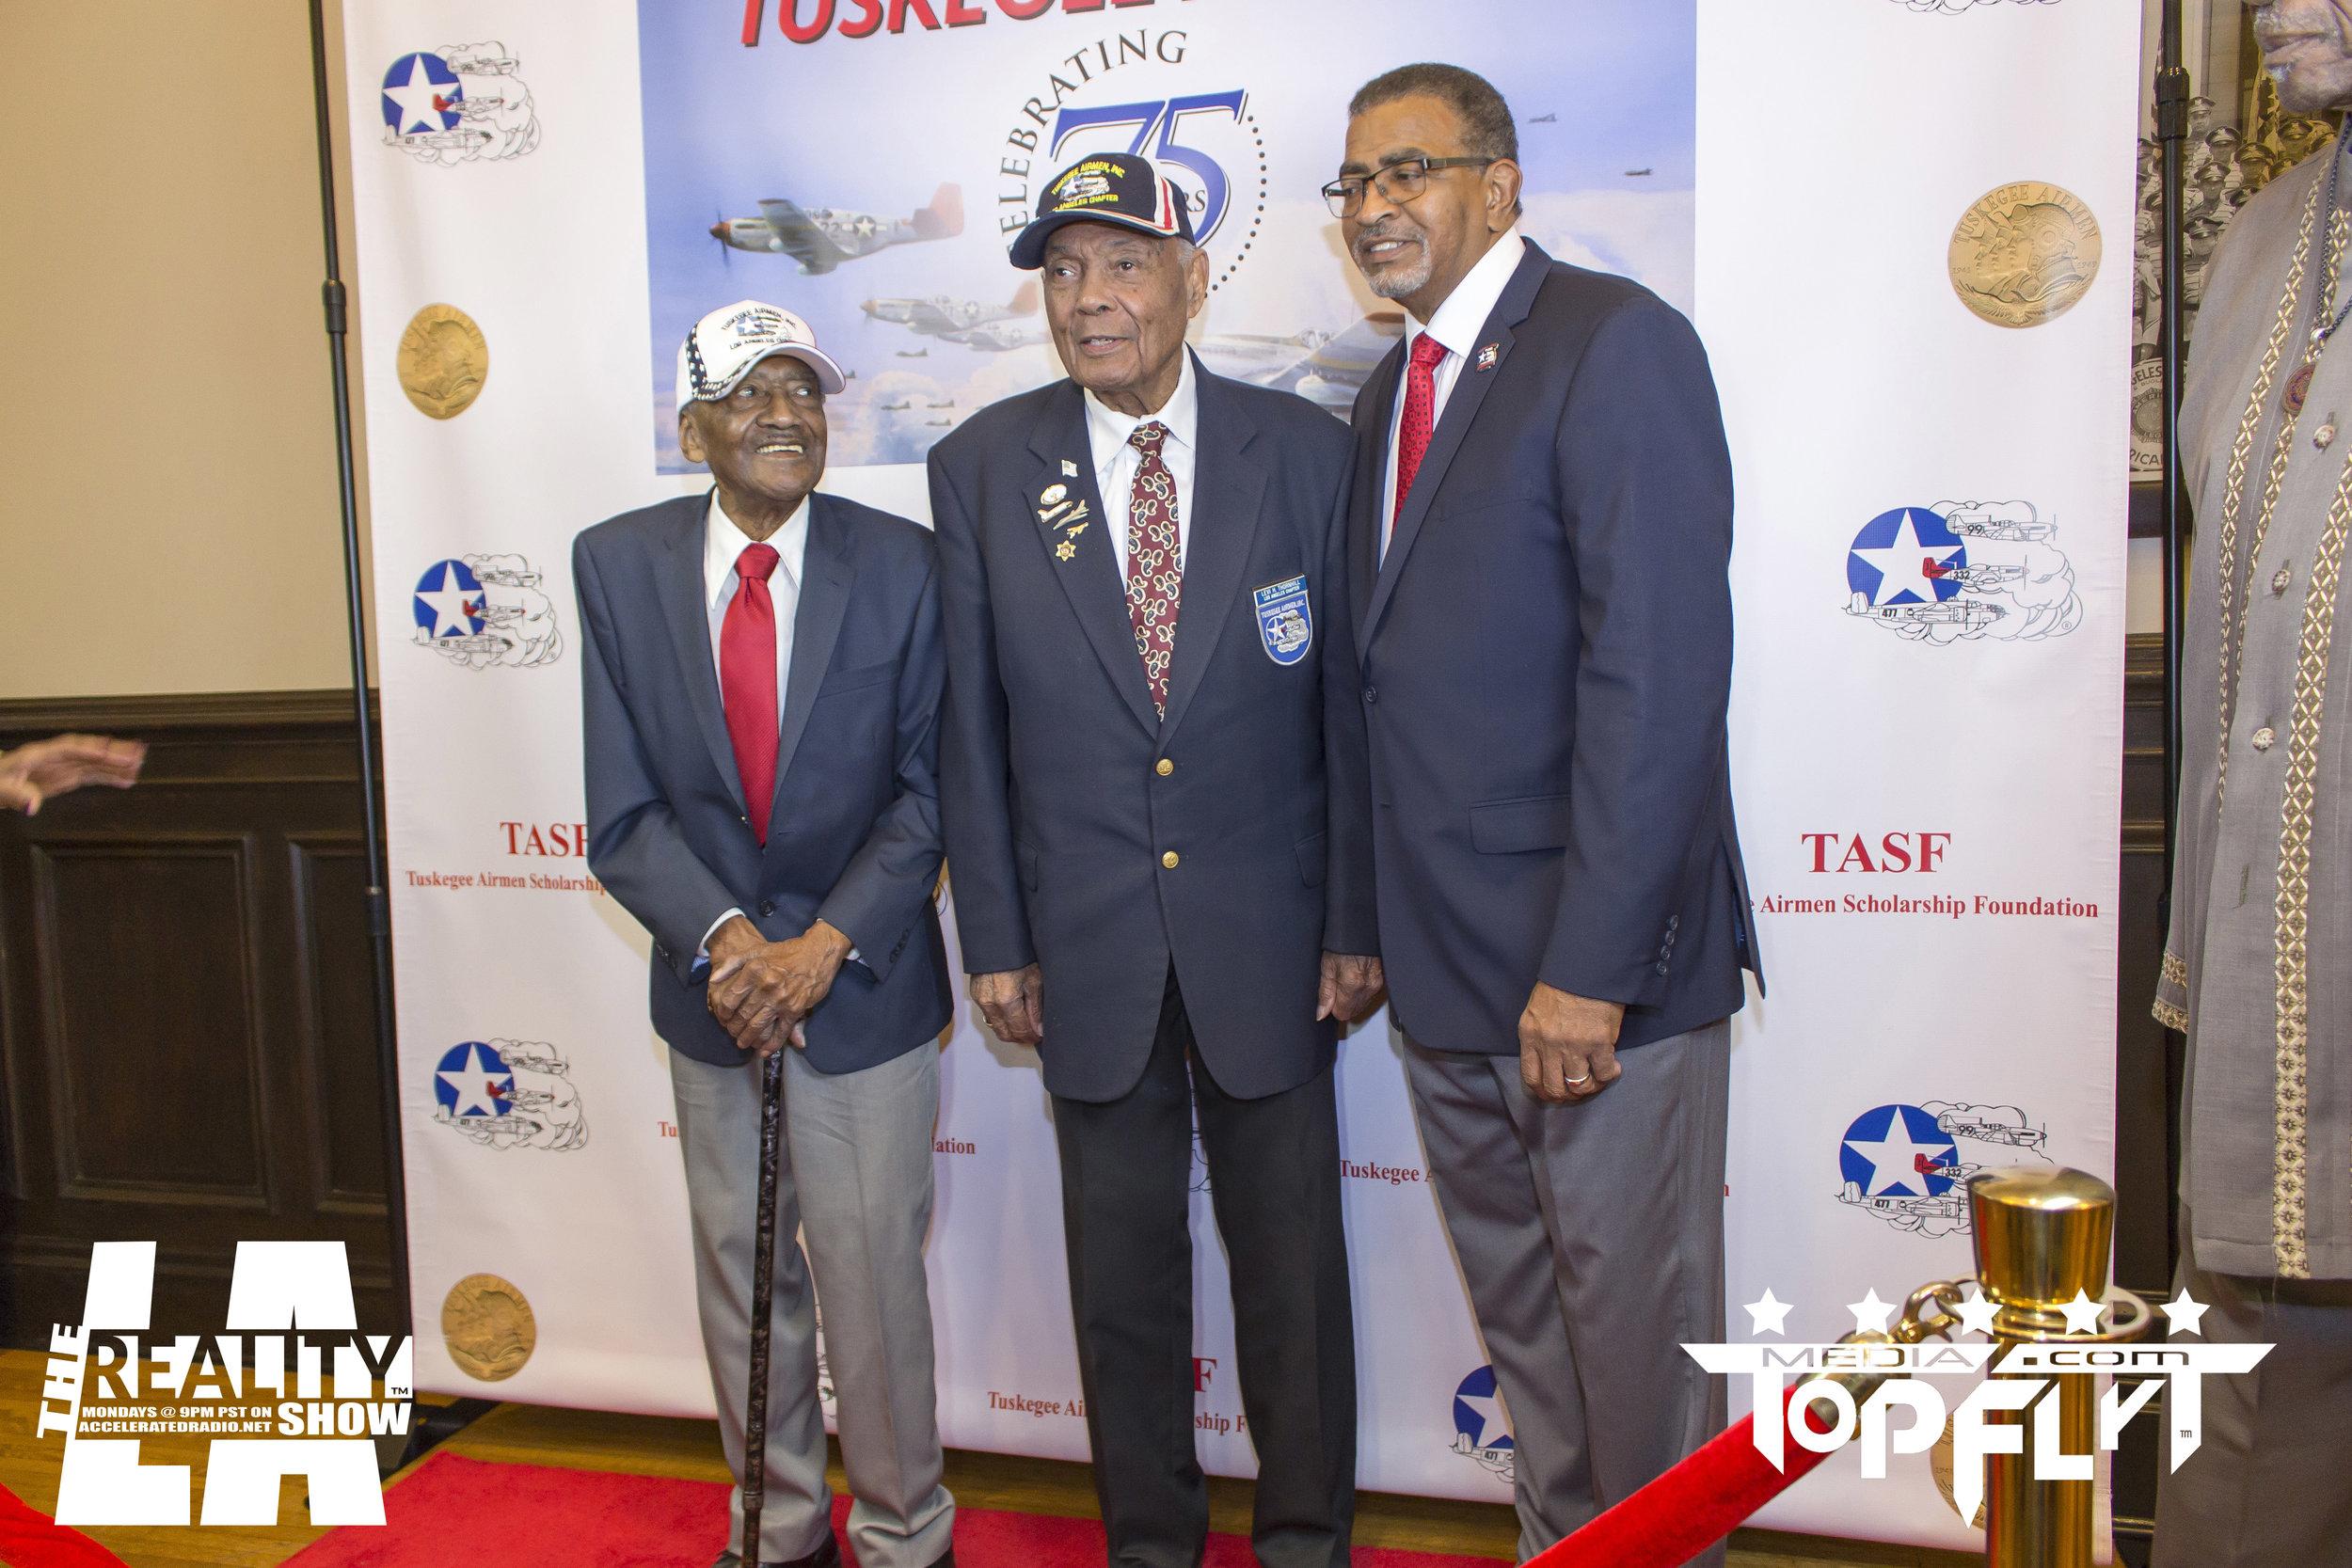 The Reality Show LA - Tuskegee Airmen 75th Anniversary VIP Reception_23.jpg